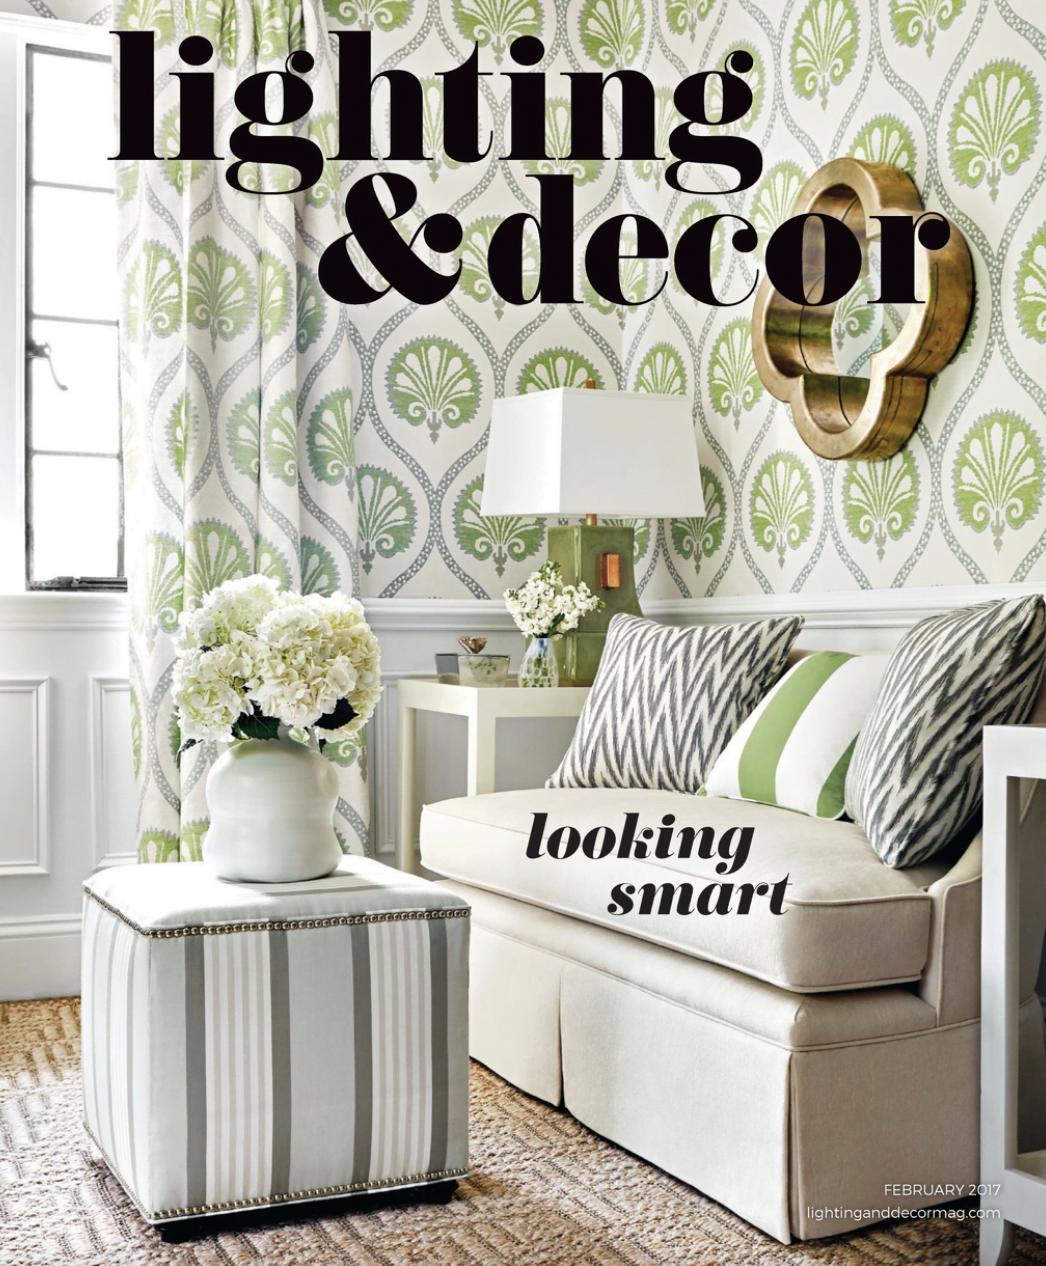 Lighting & Decor Magazine Features Stonewood